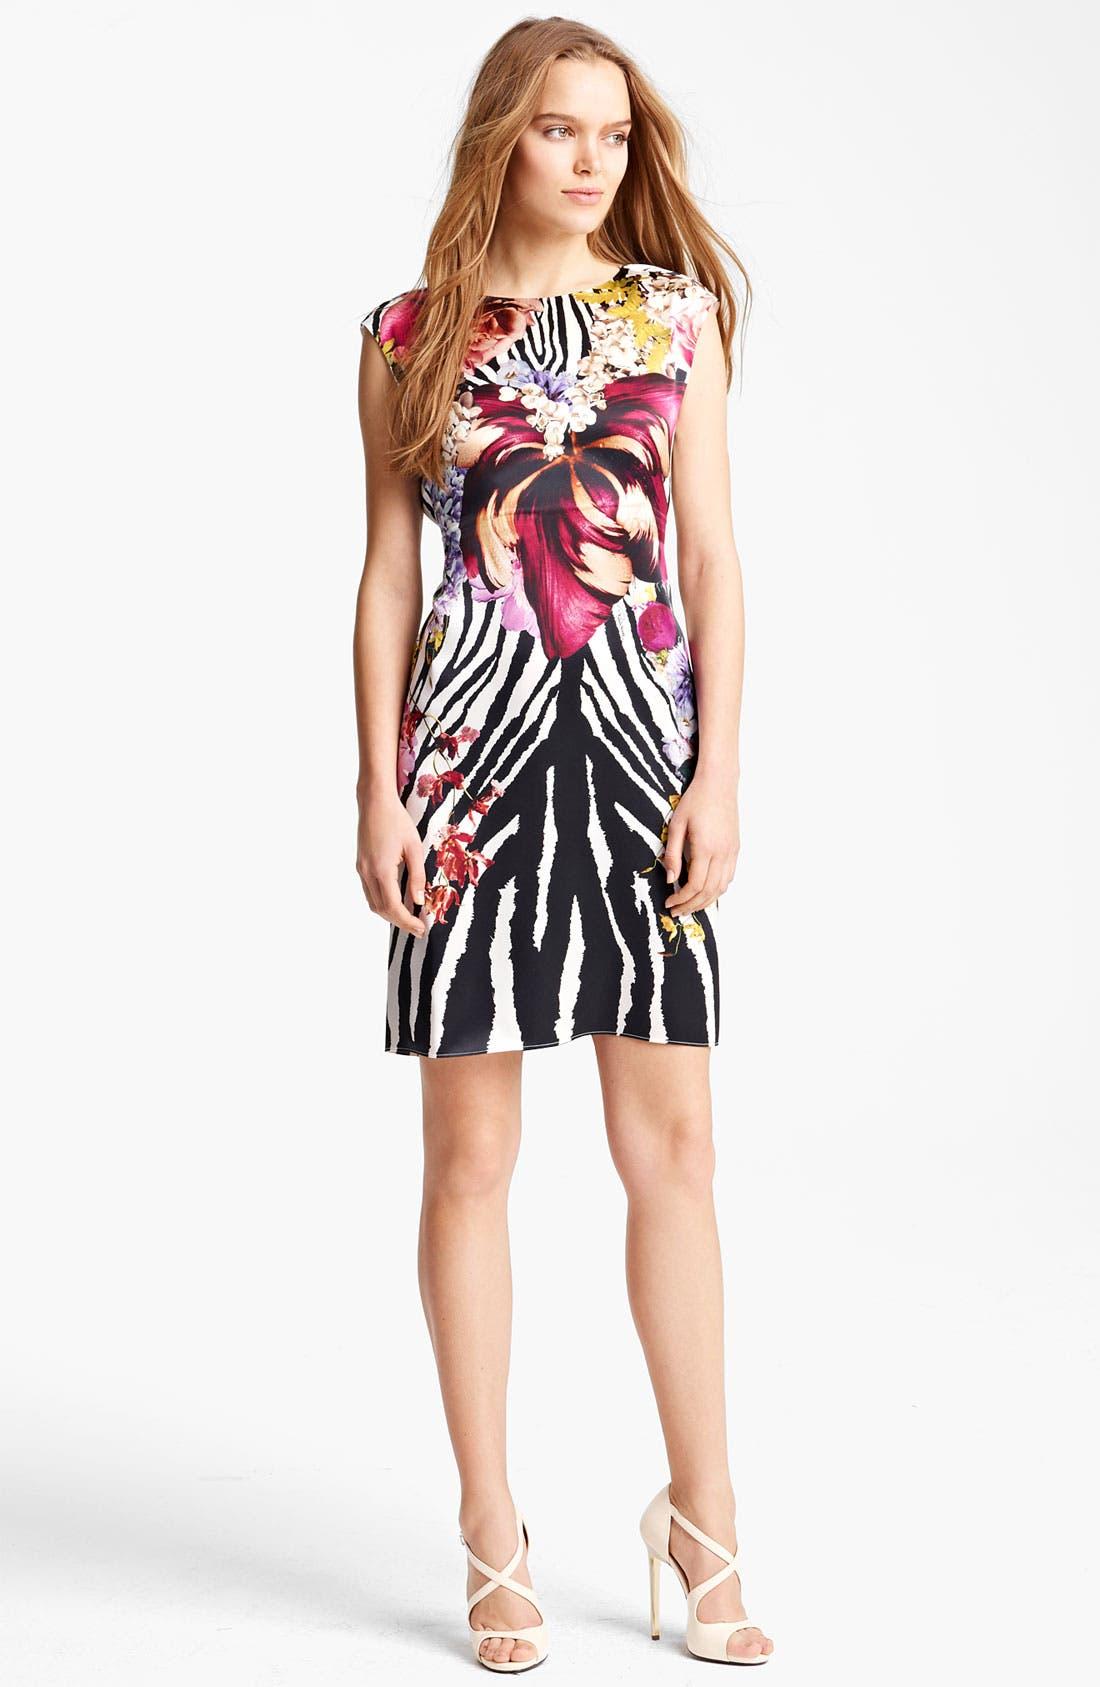 Alternate Image 1 Selected - Roberto Cavalli Floral & Animal Print Dress